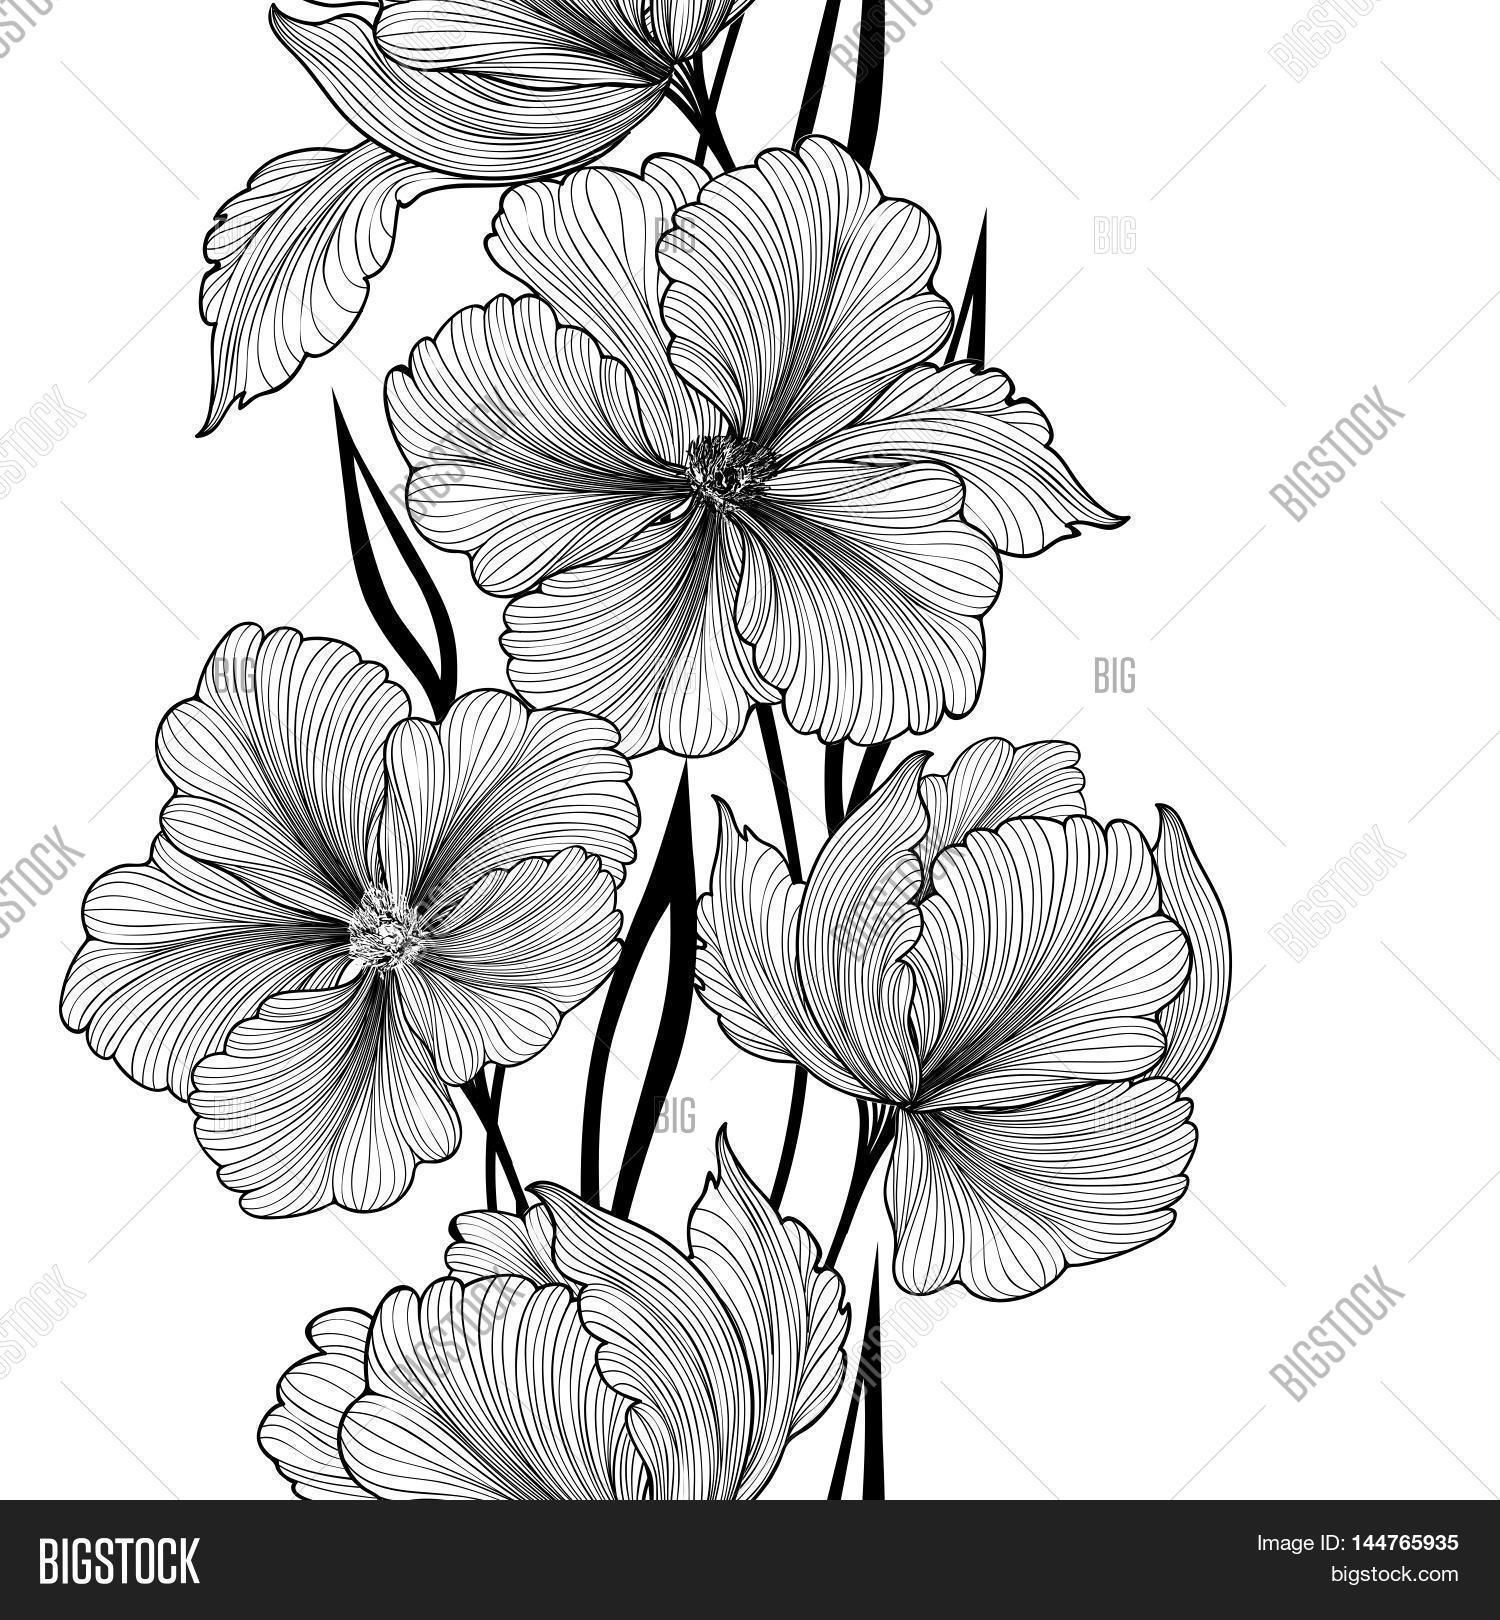 Black white flower vector photo free trial bigstock black and white flower pattern flourish vertical bouquet garland background floral seamless texture mightylinksfo